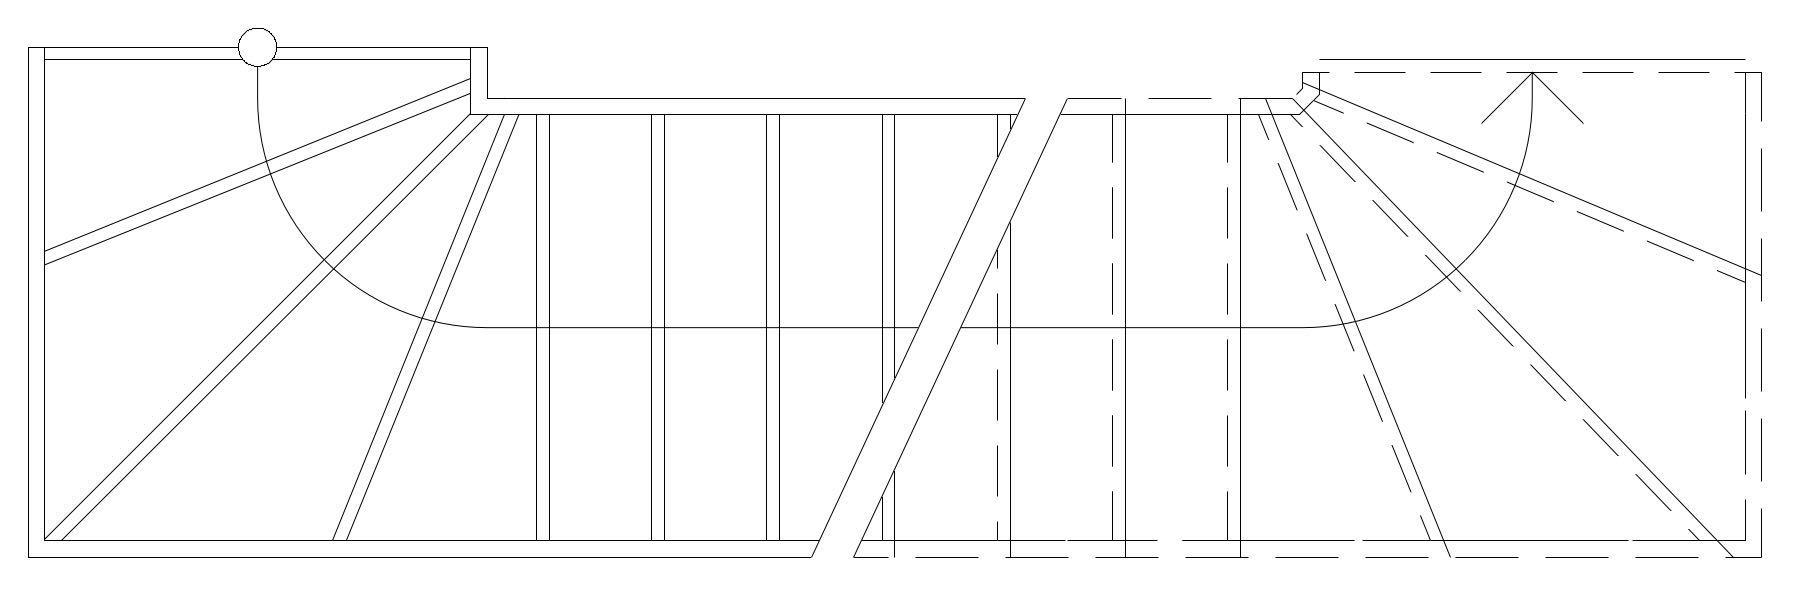 stair2.jpg.a1387e47fa2d31b705635819abaf6f7c.jpg